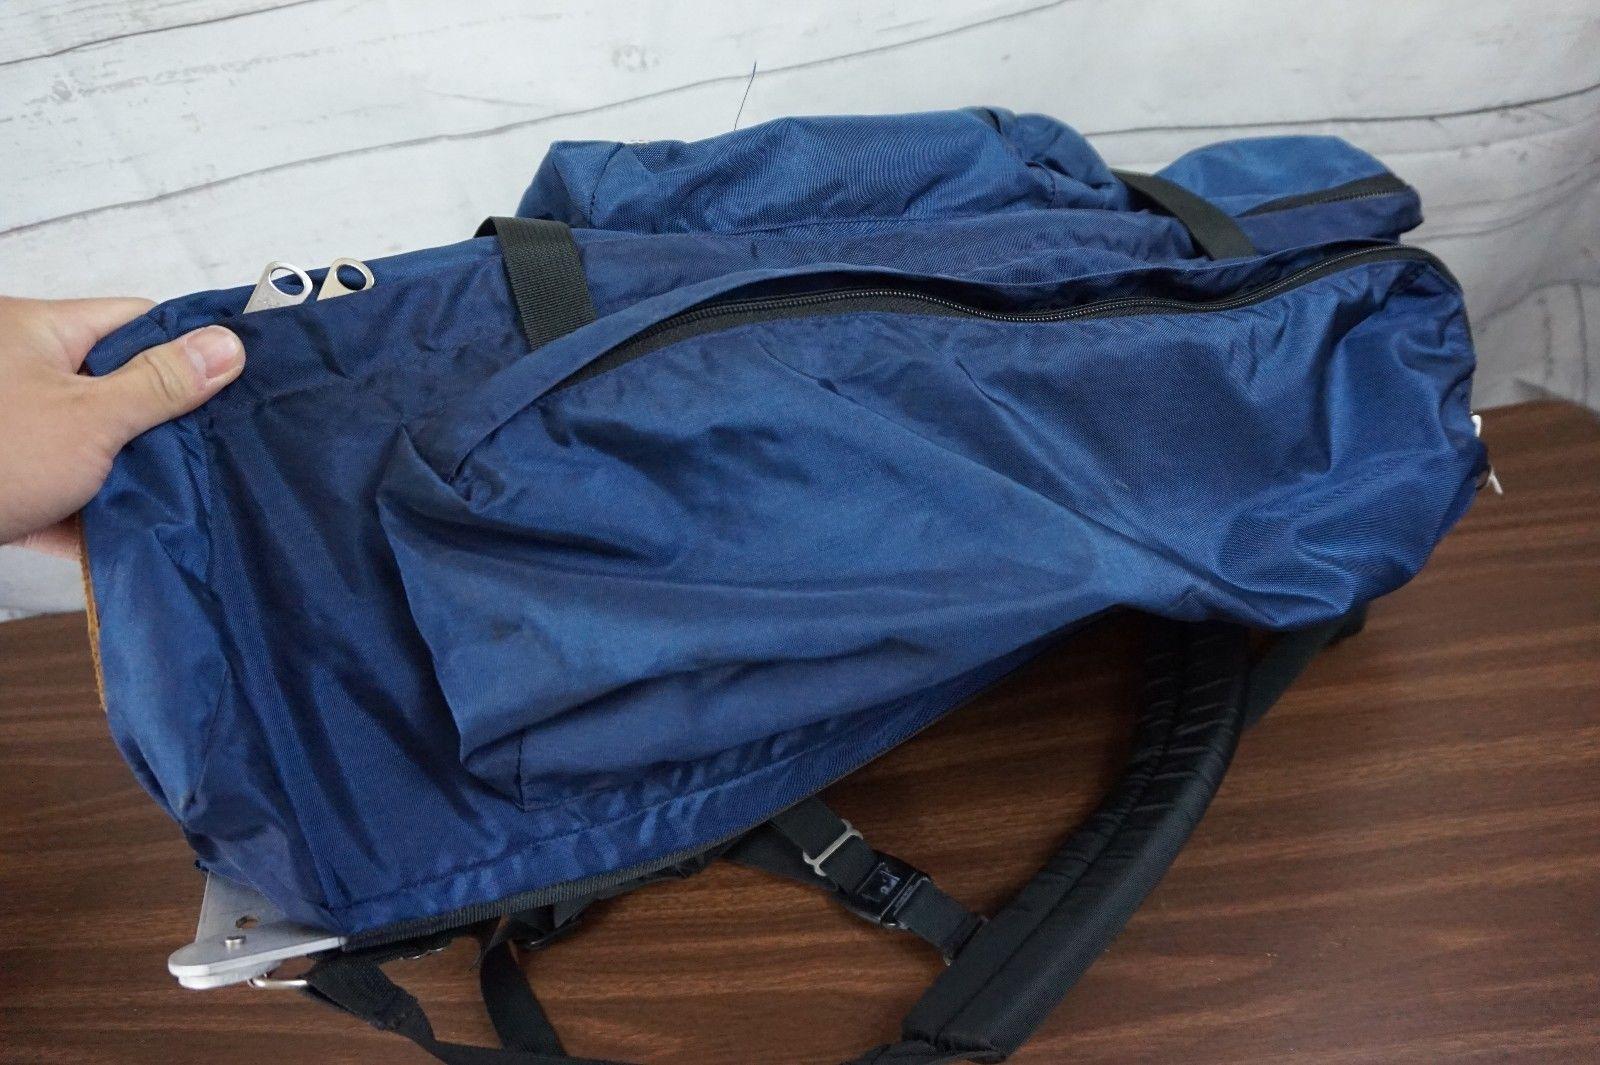 VTG The North Face Hiking Camping XL Backpack w/ Internal Frame Bag